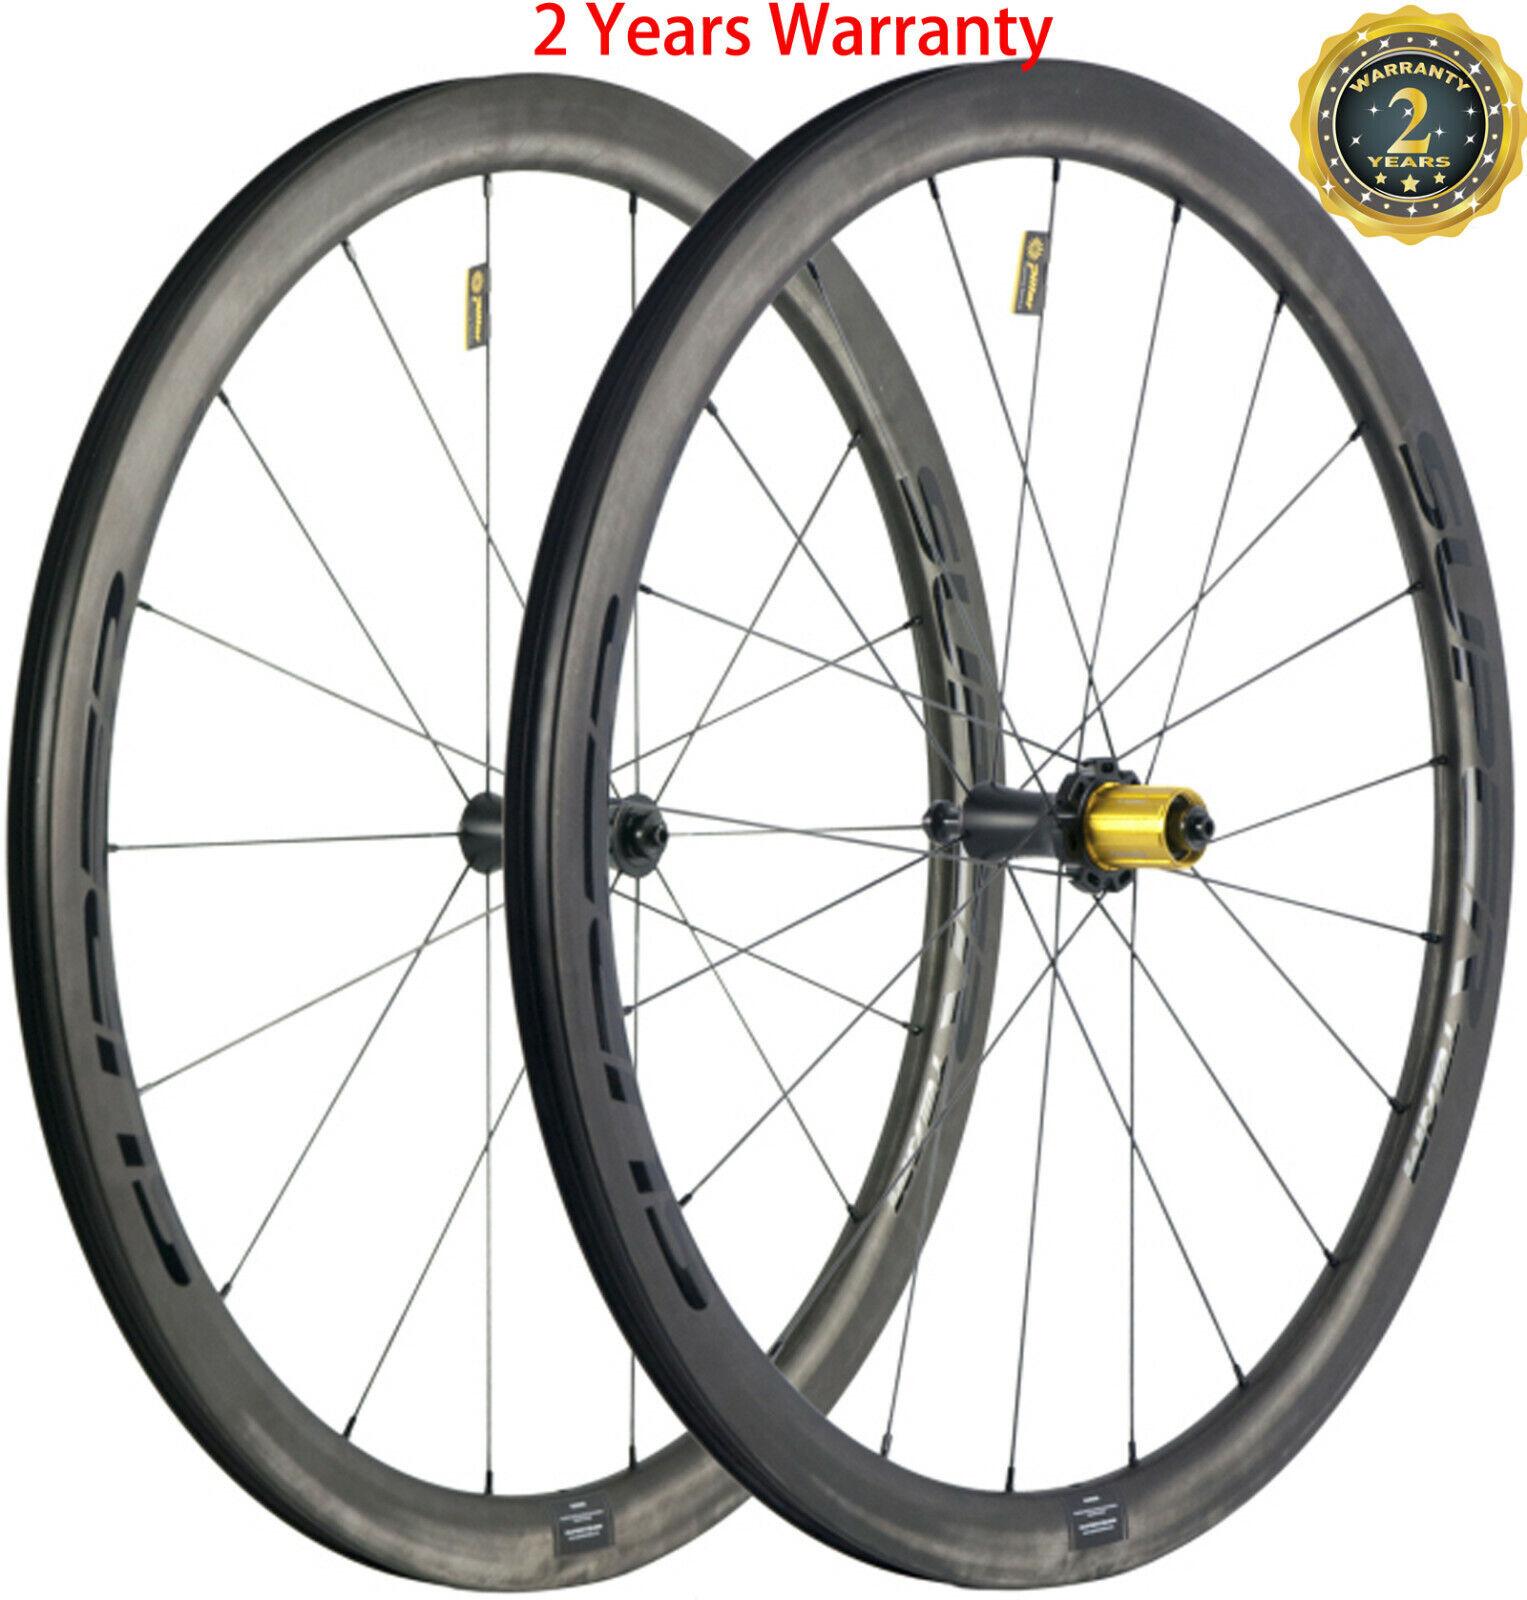 40mm Carbon Wheelset Road Wheels Ceramic Bearing 700C Clincher Tubular Tubeless